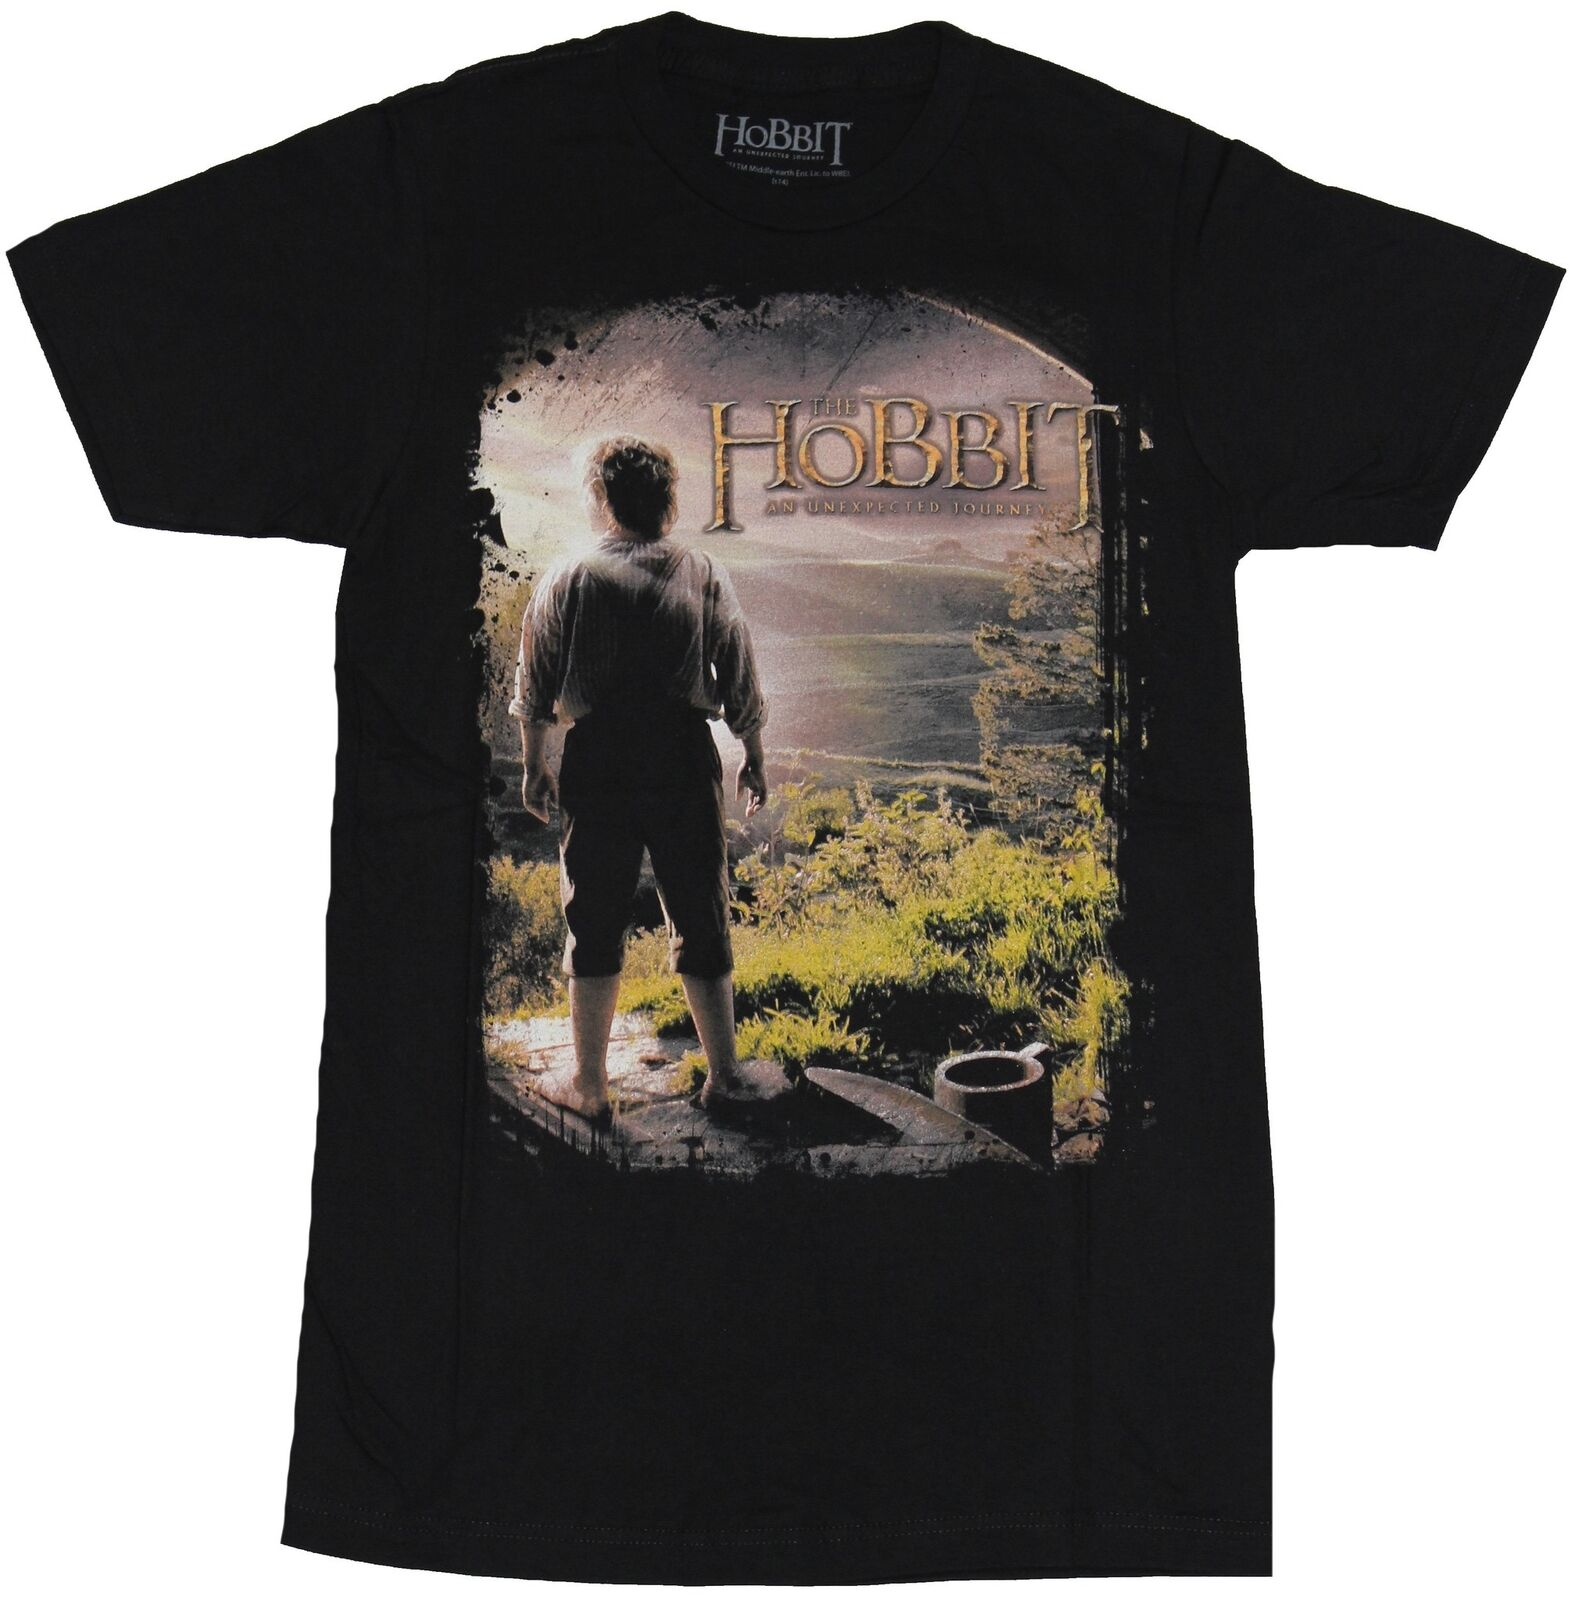 2e1d5eb0a The Hobbit Mens T-Shirt - Unexpected Journey Color Poster Image Men Women  Unisex Fashion tshirt Free Shipping WHITE